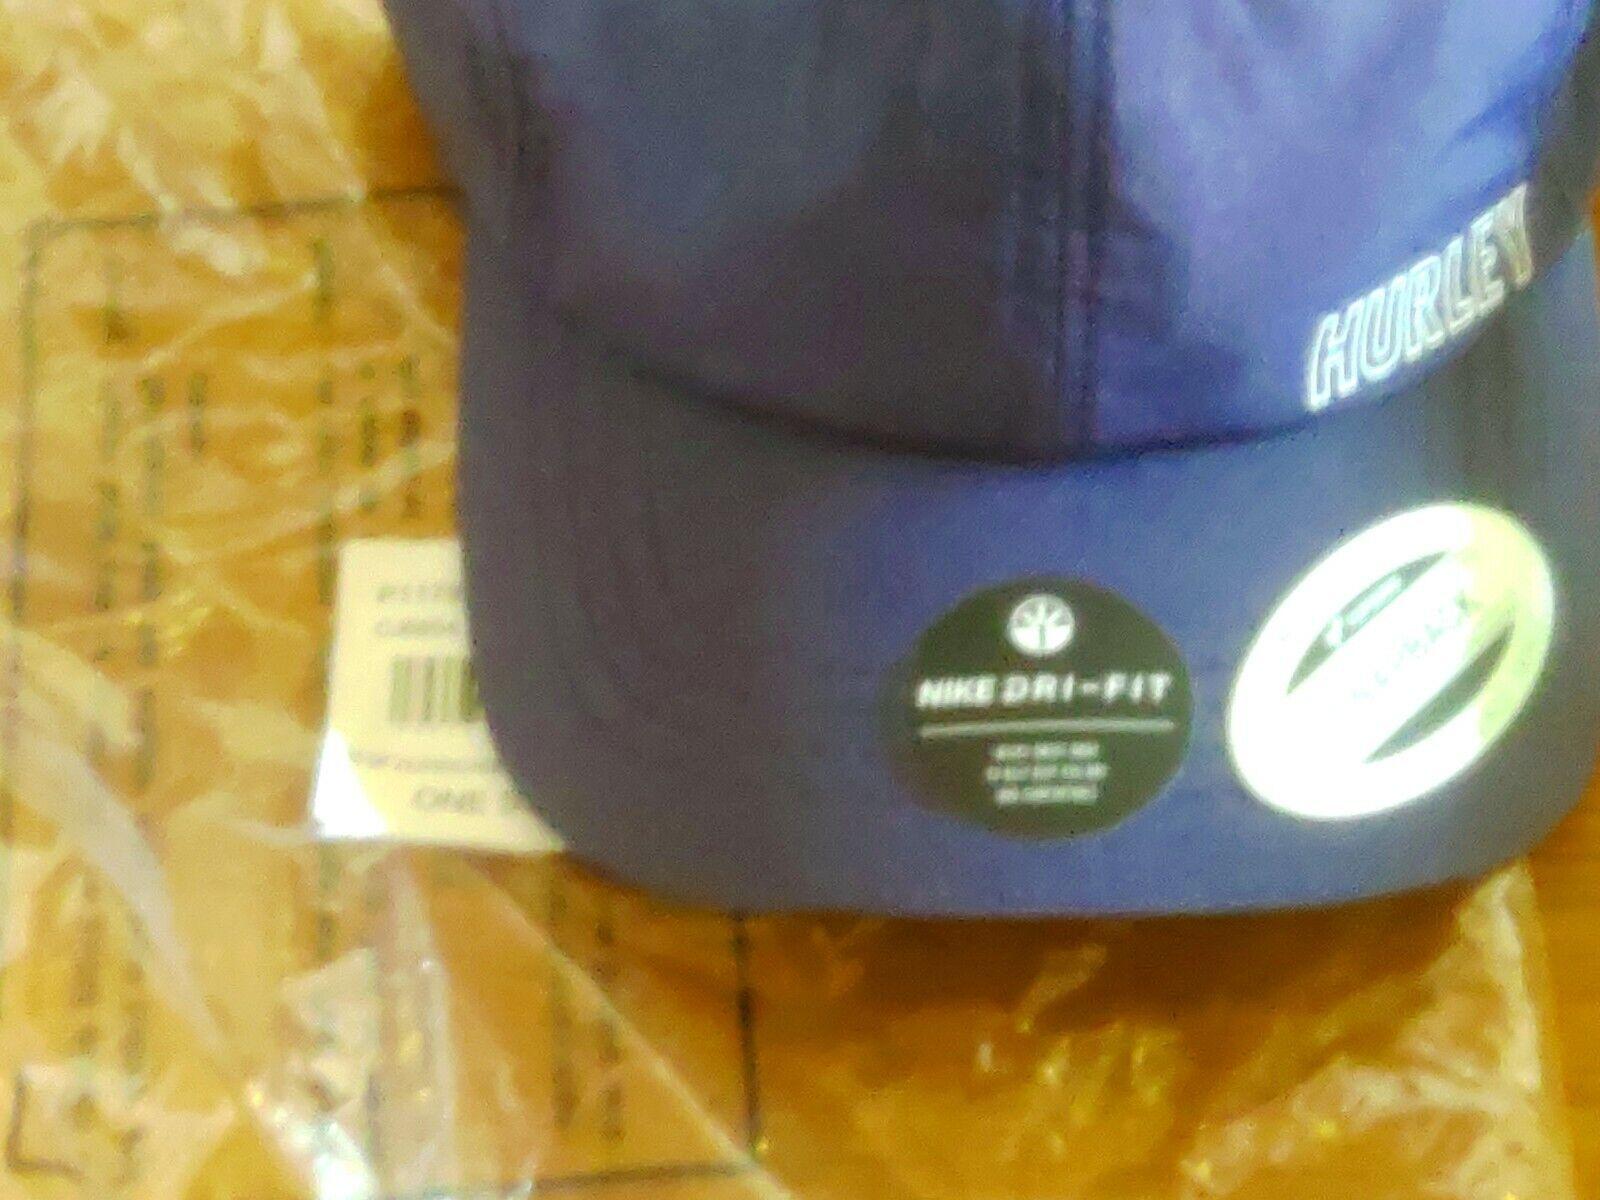 Hurley One&Only Black NikeDri Fit Basecap Schirmmütze blau/ weiß one Size- neu